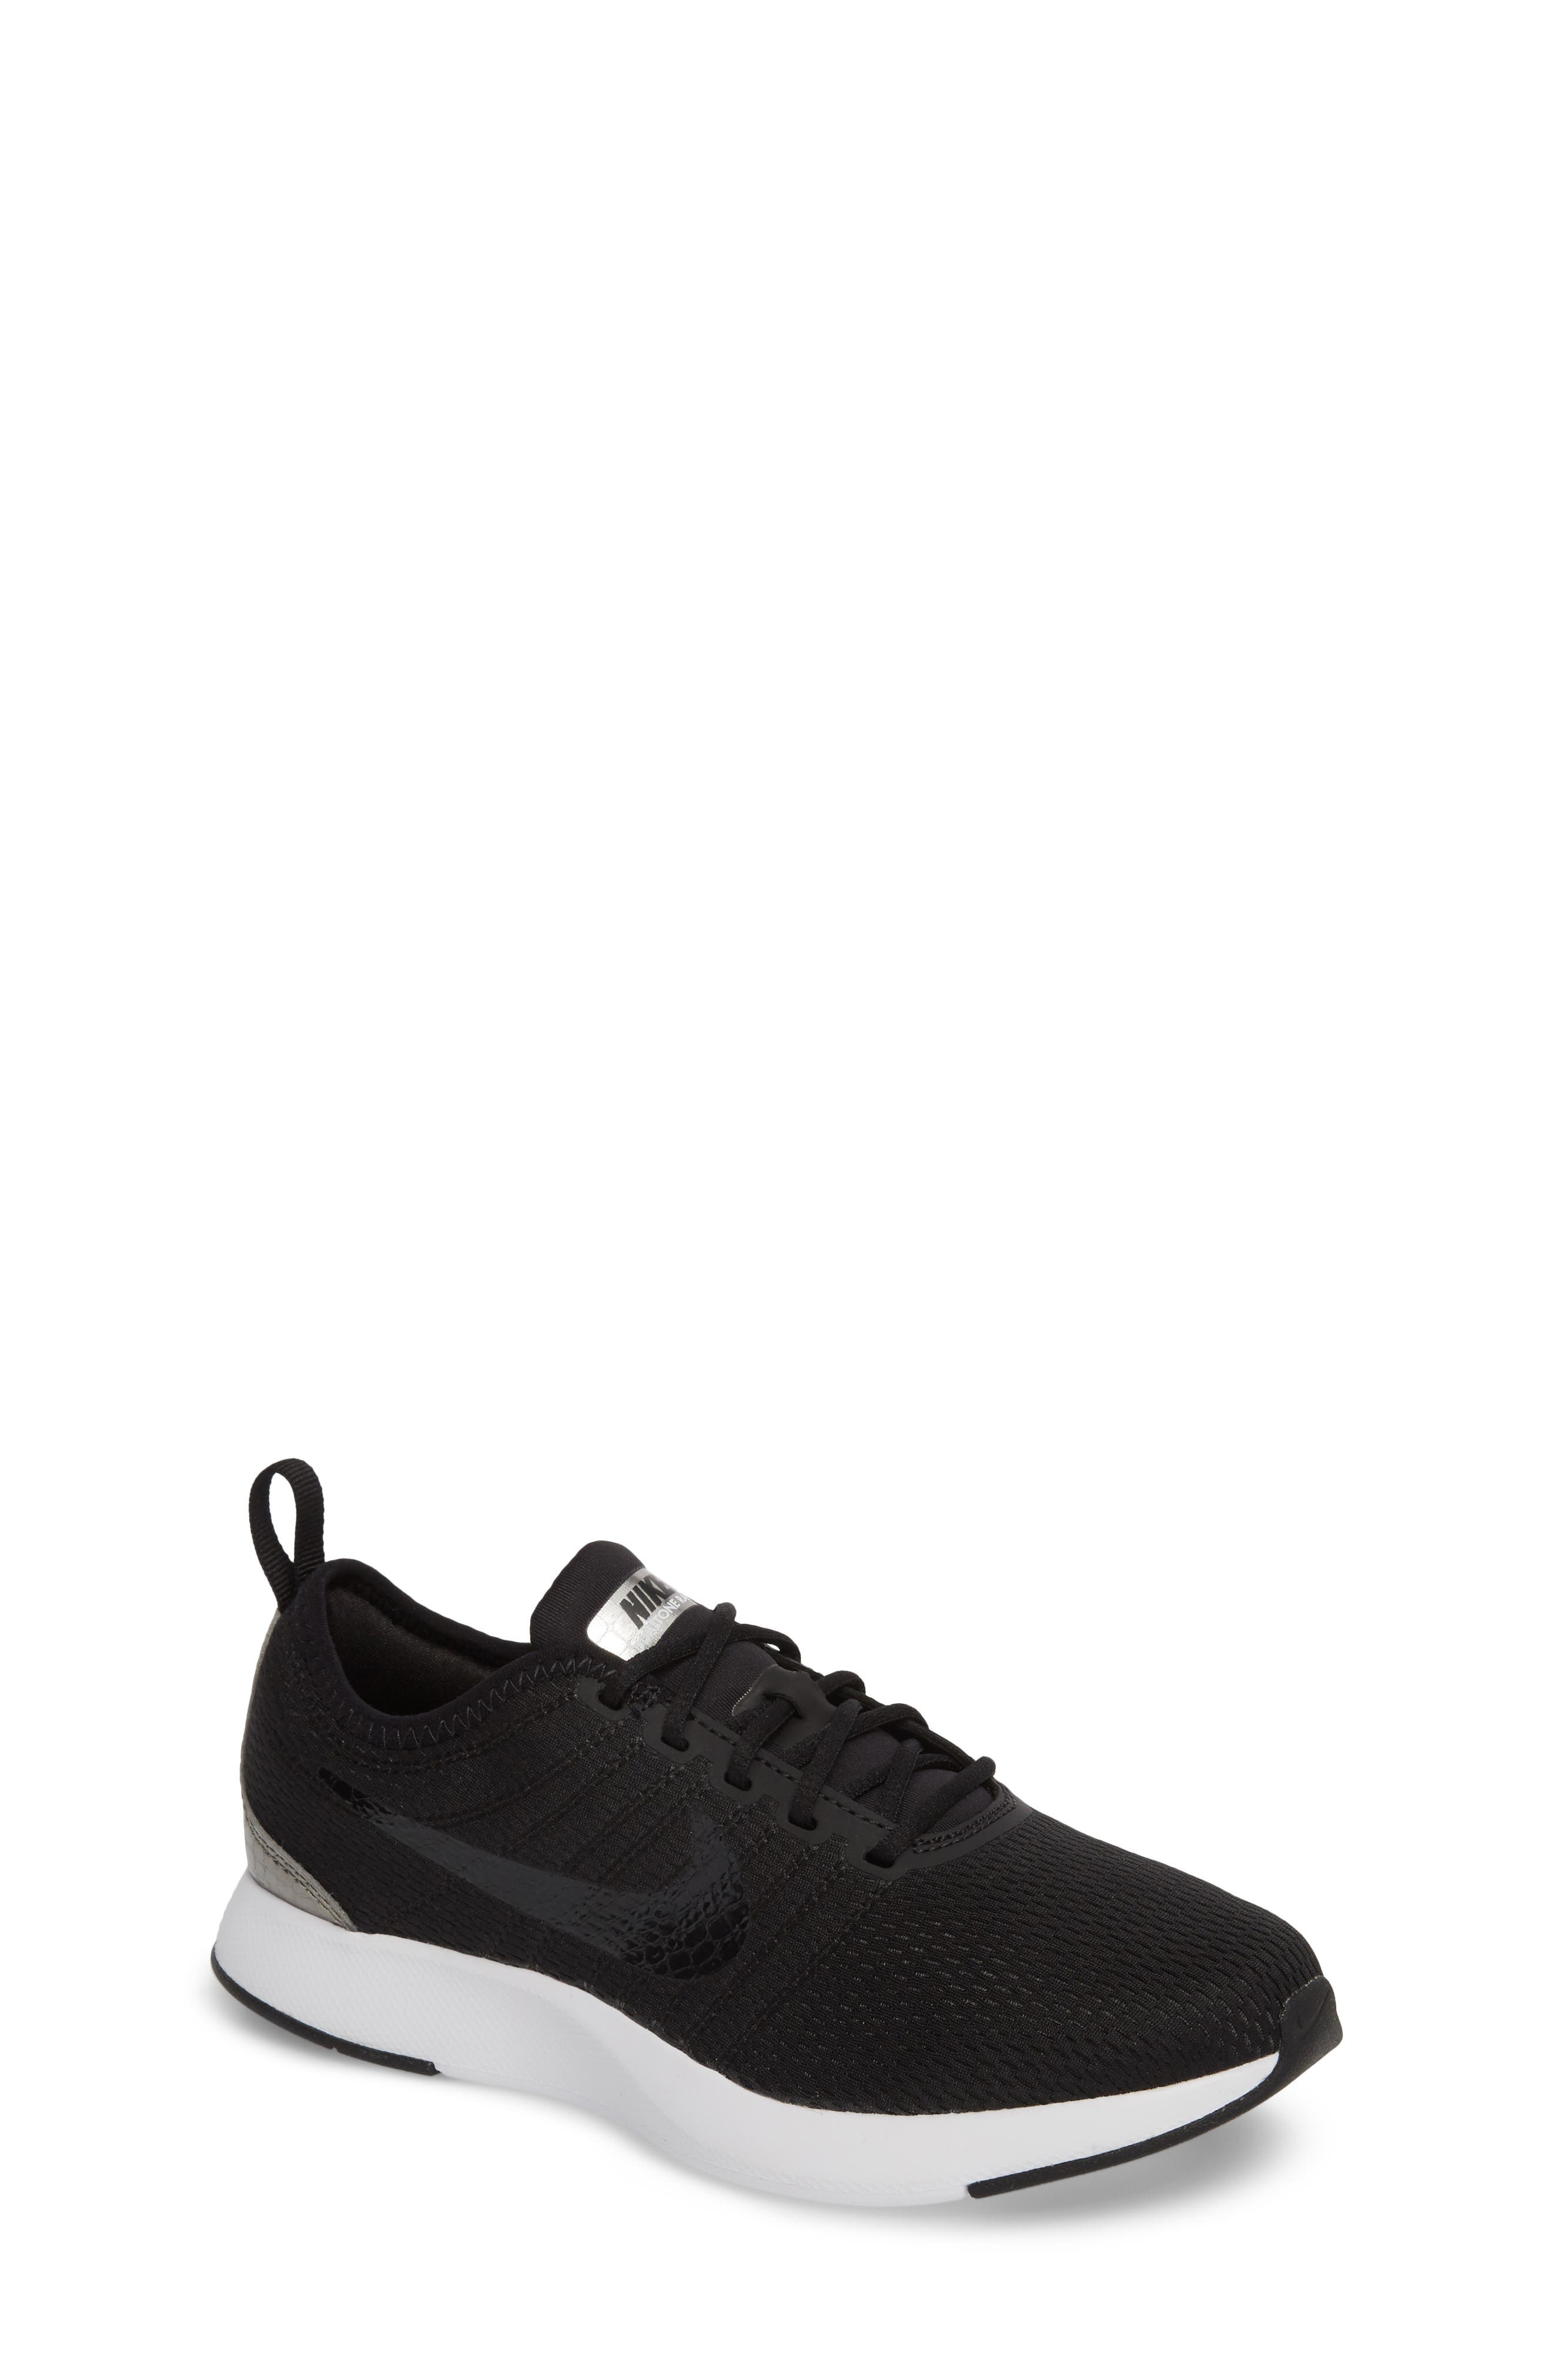 Dualtone Racer GS Sneaker,                             Main thumbnail 1, color,                             009